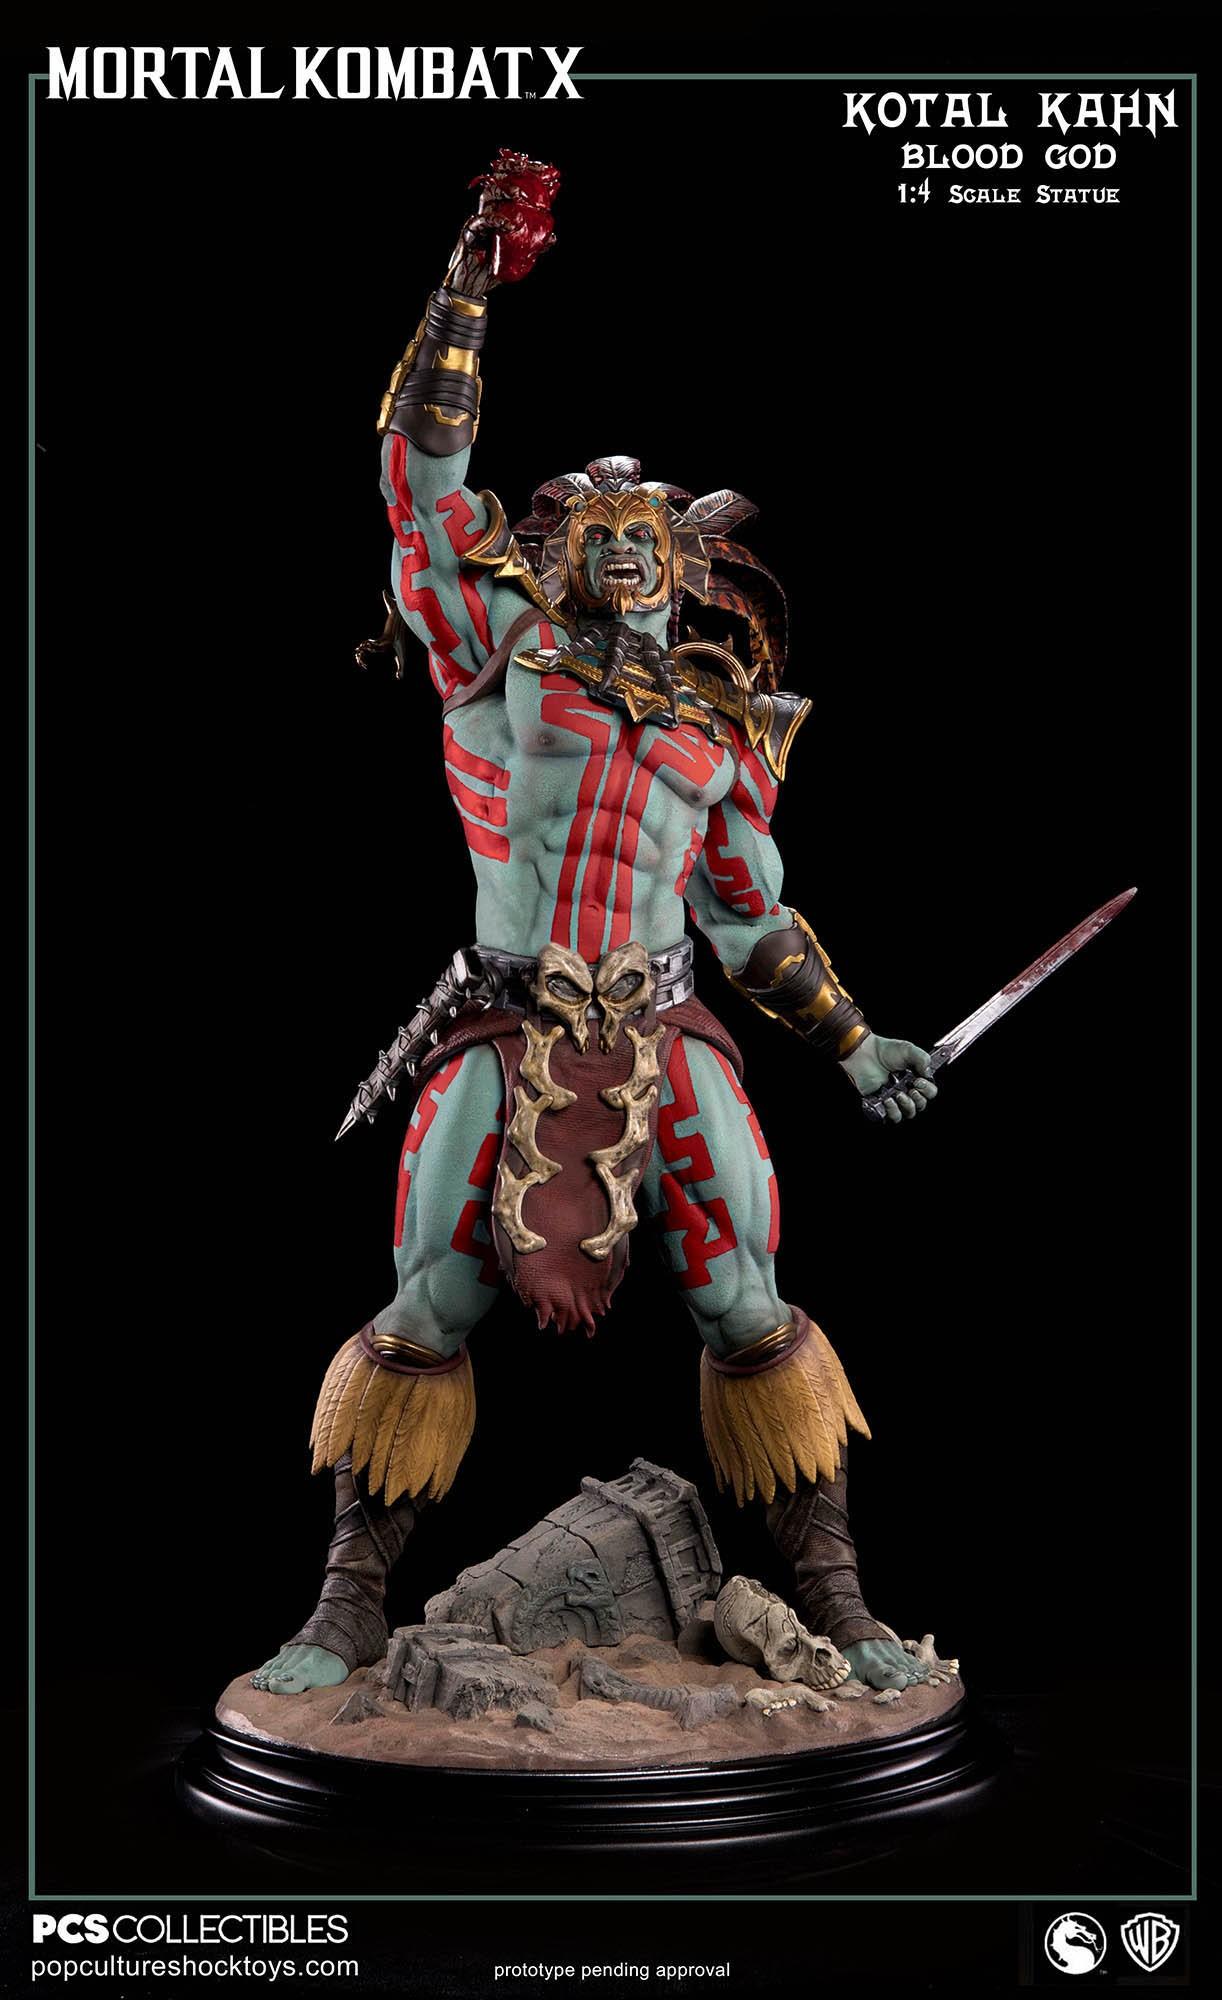 [Pop Culture Shock] Mortal Kombat X: Kotal Kahn 1:4 scale PCS-Kotal-Kahn-Blood-God-023